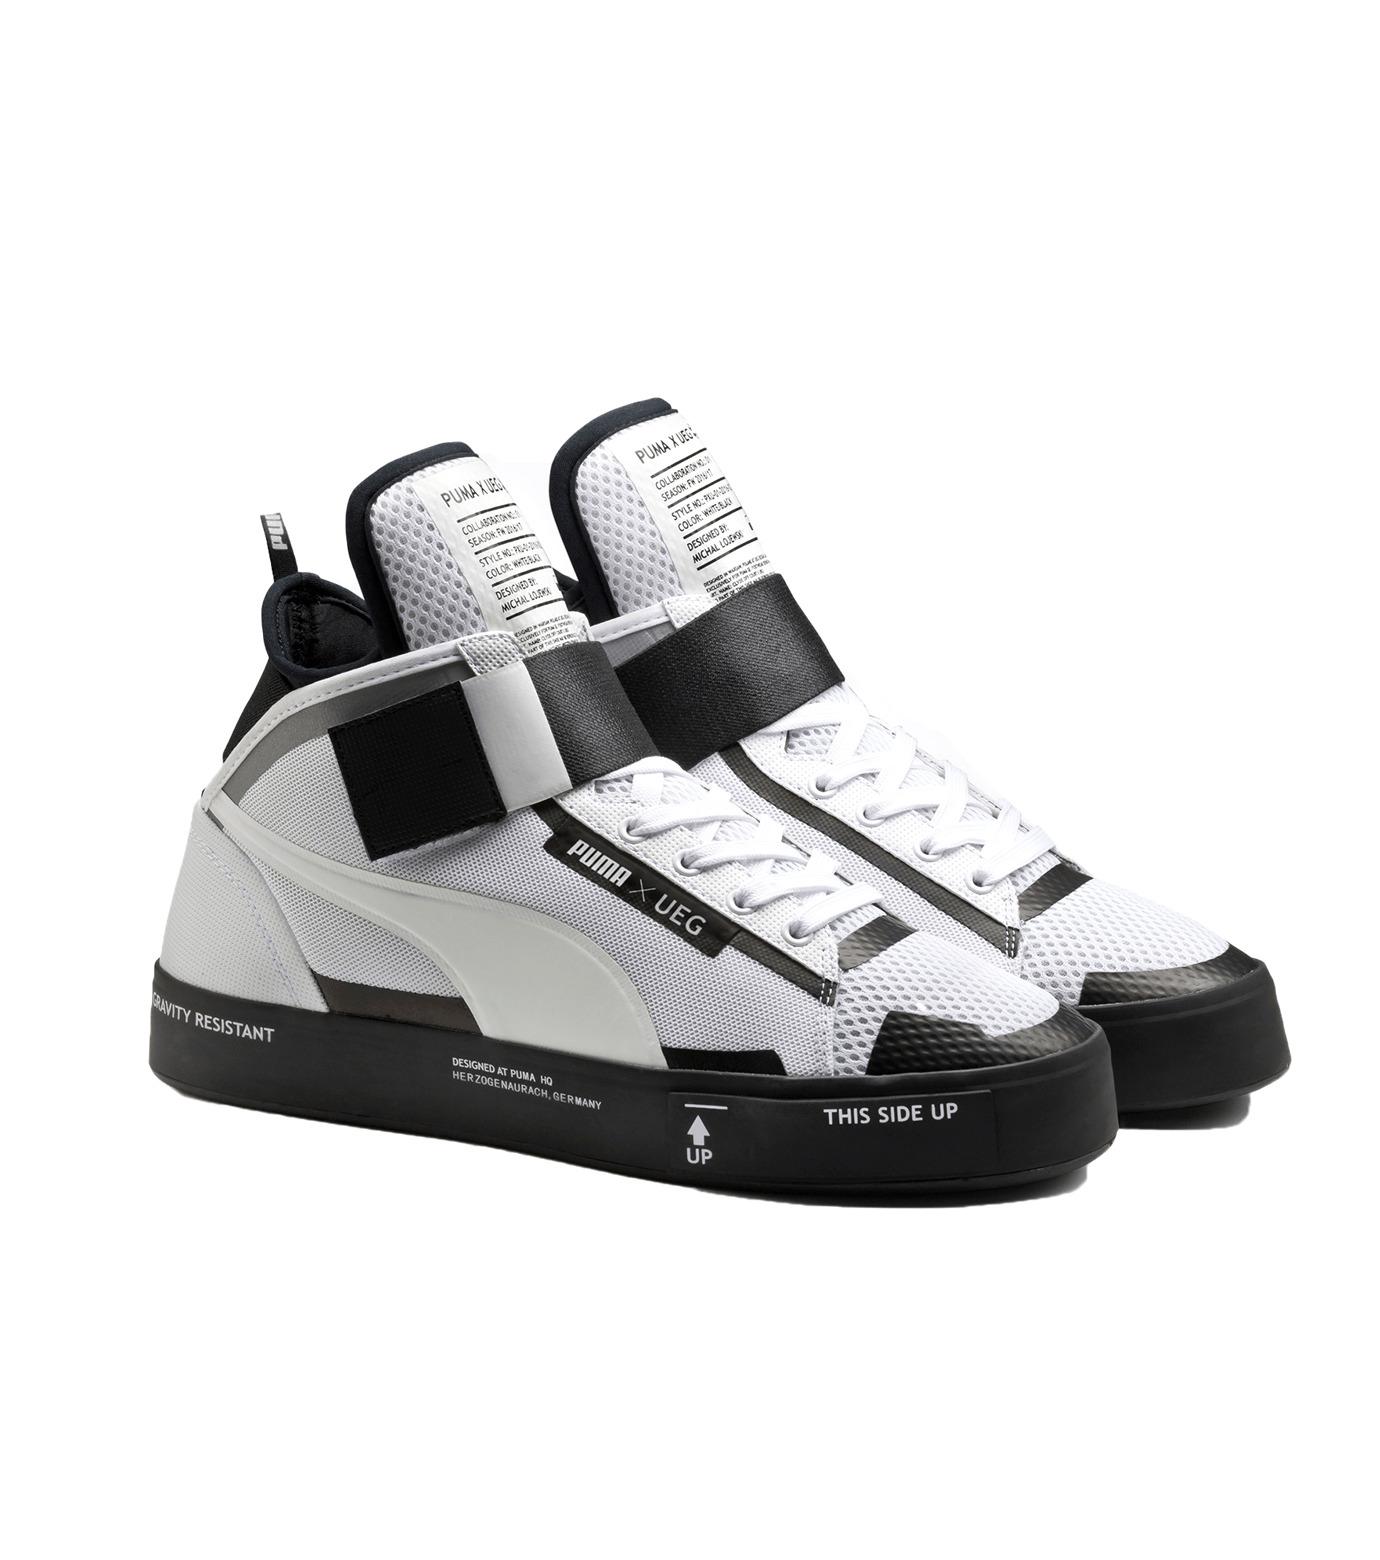 PUMA(プーマ)のCOURT PLAY X UEG-WHITE(シューズ/shoes)-361497-4 拡大詳細画像3